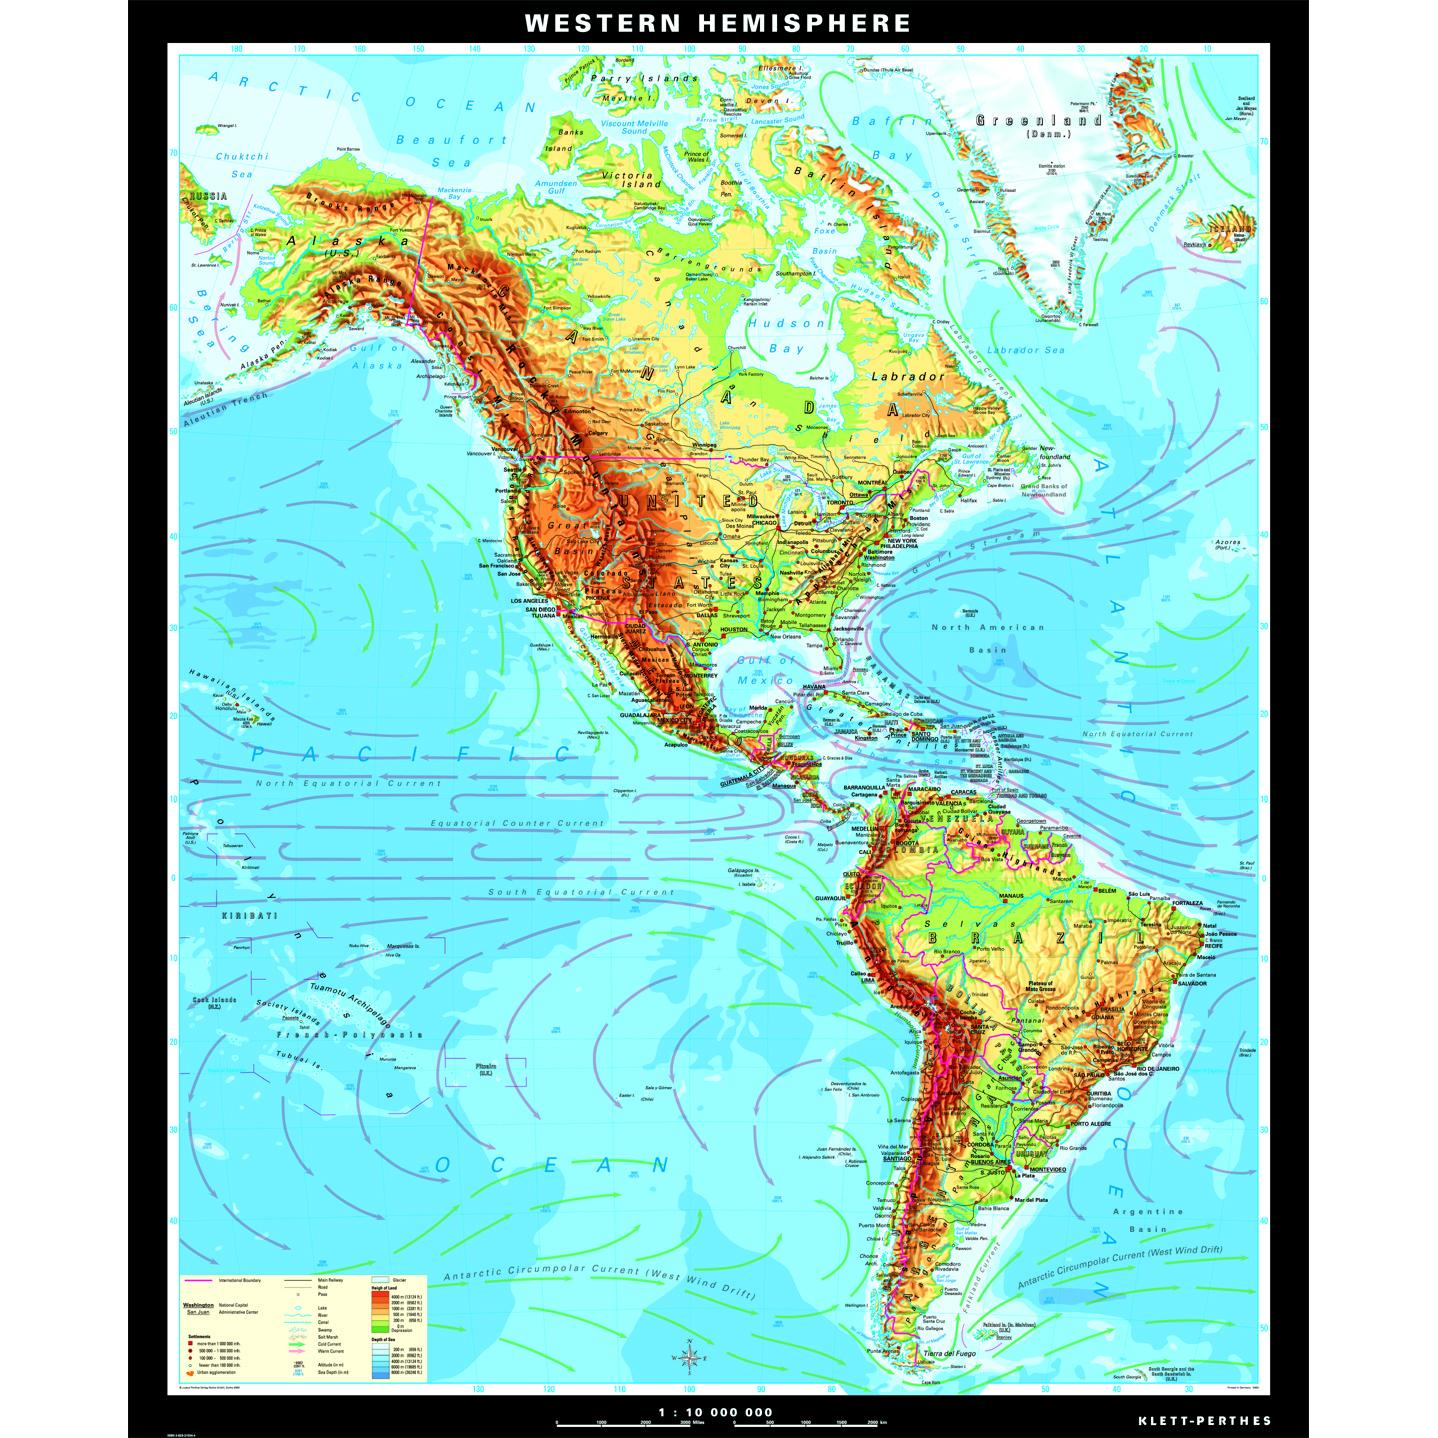 The Western Hemisphere Physical Map